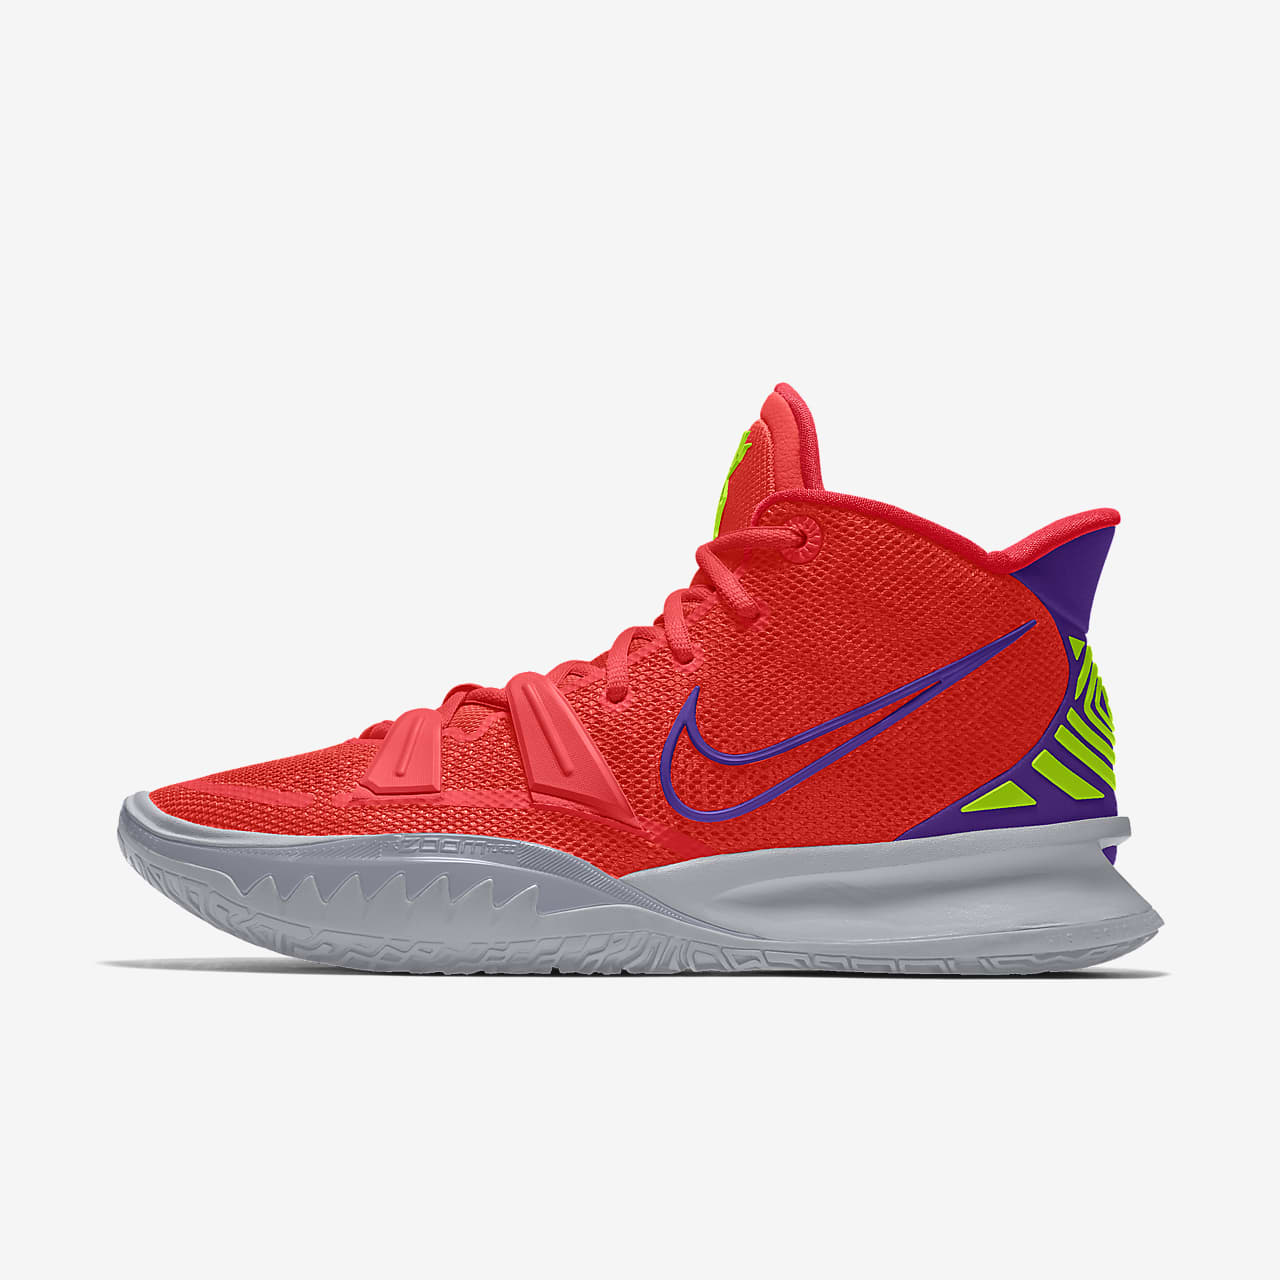 Kyrie 7 By You Custom Basketball Shoes